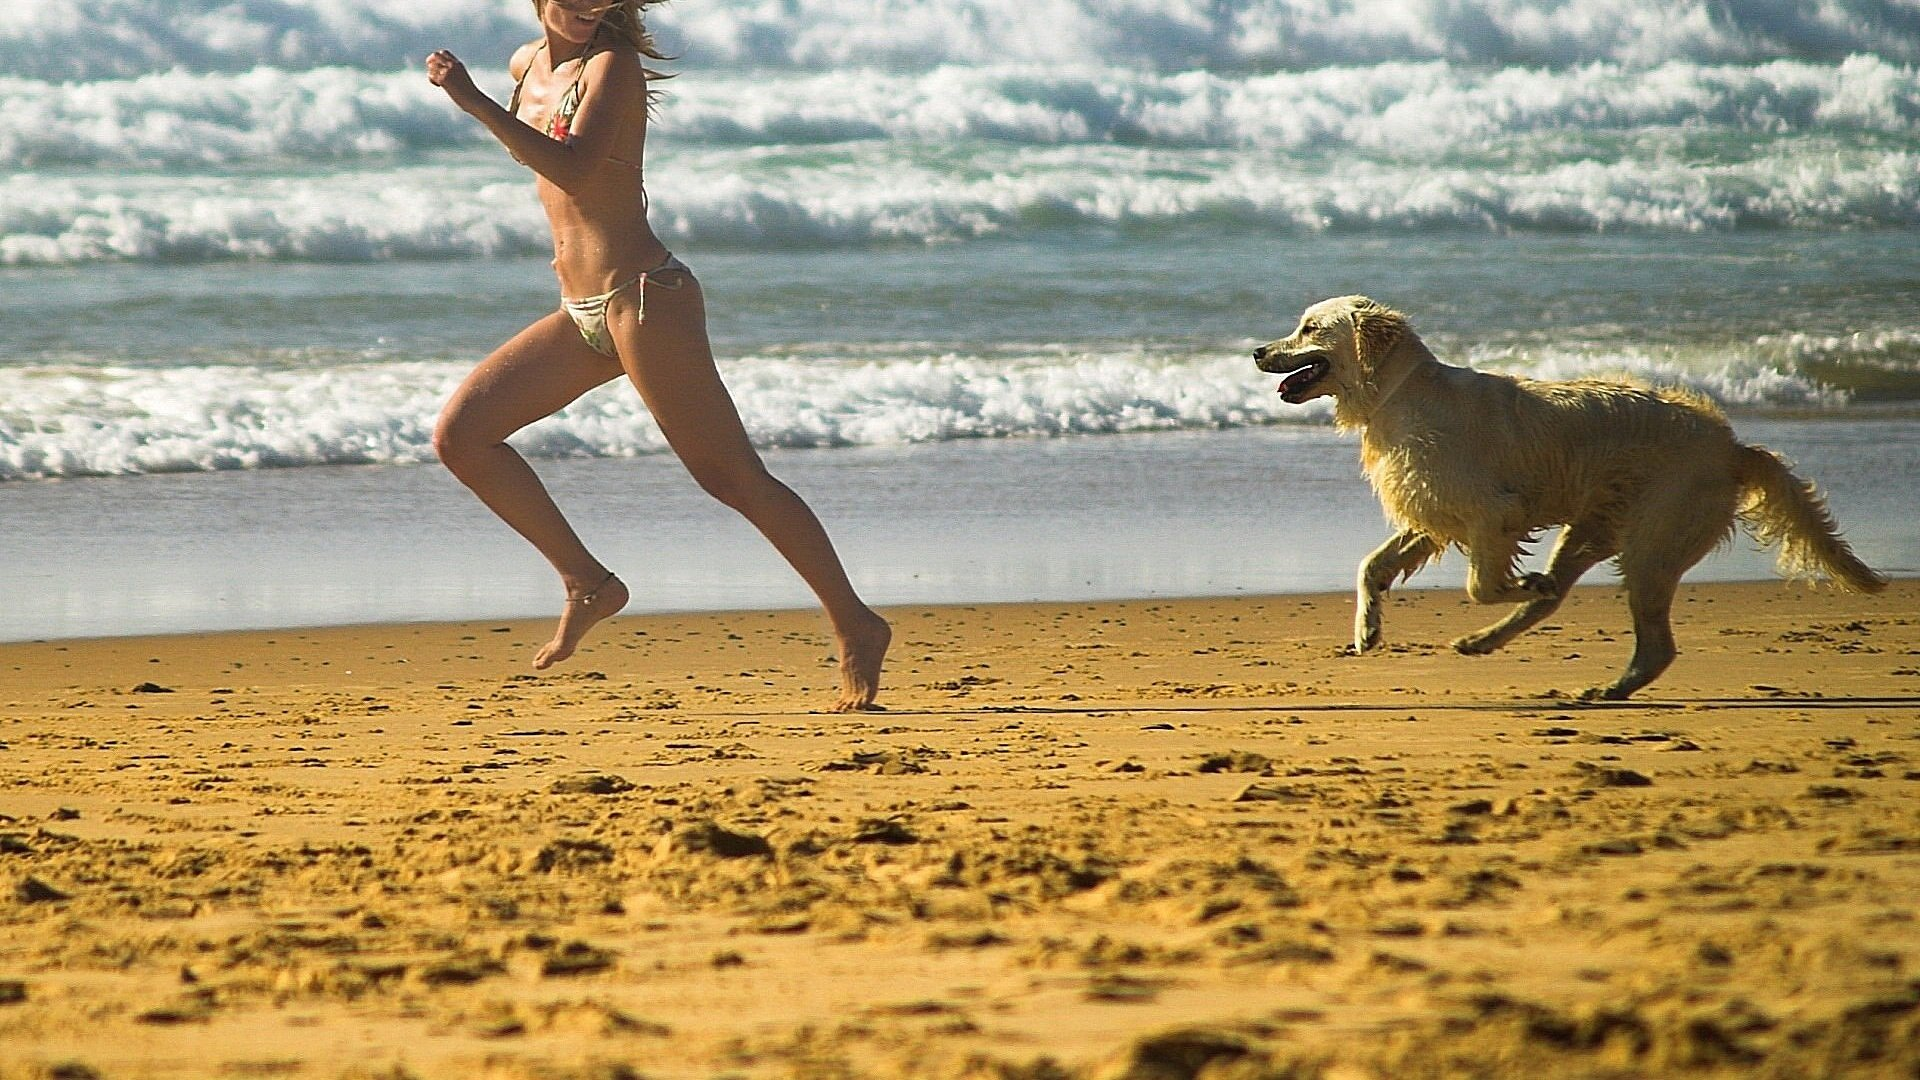 Flip flop hgtv christina nude